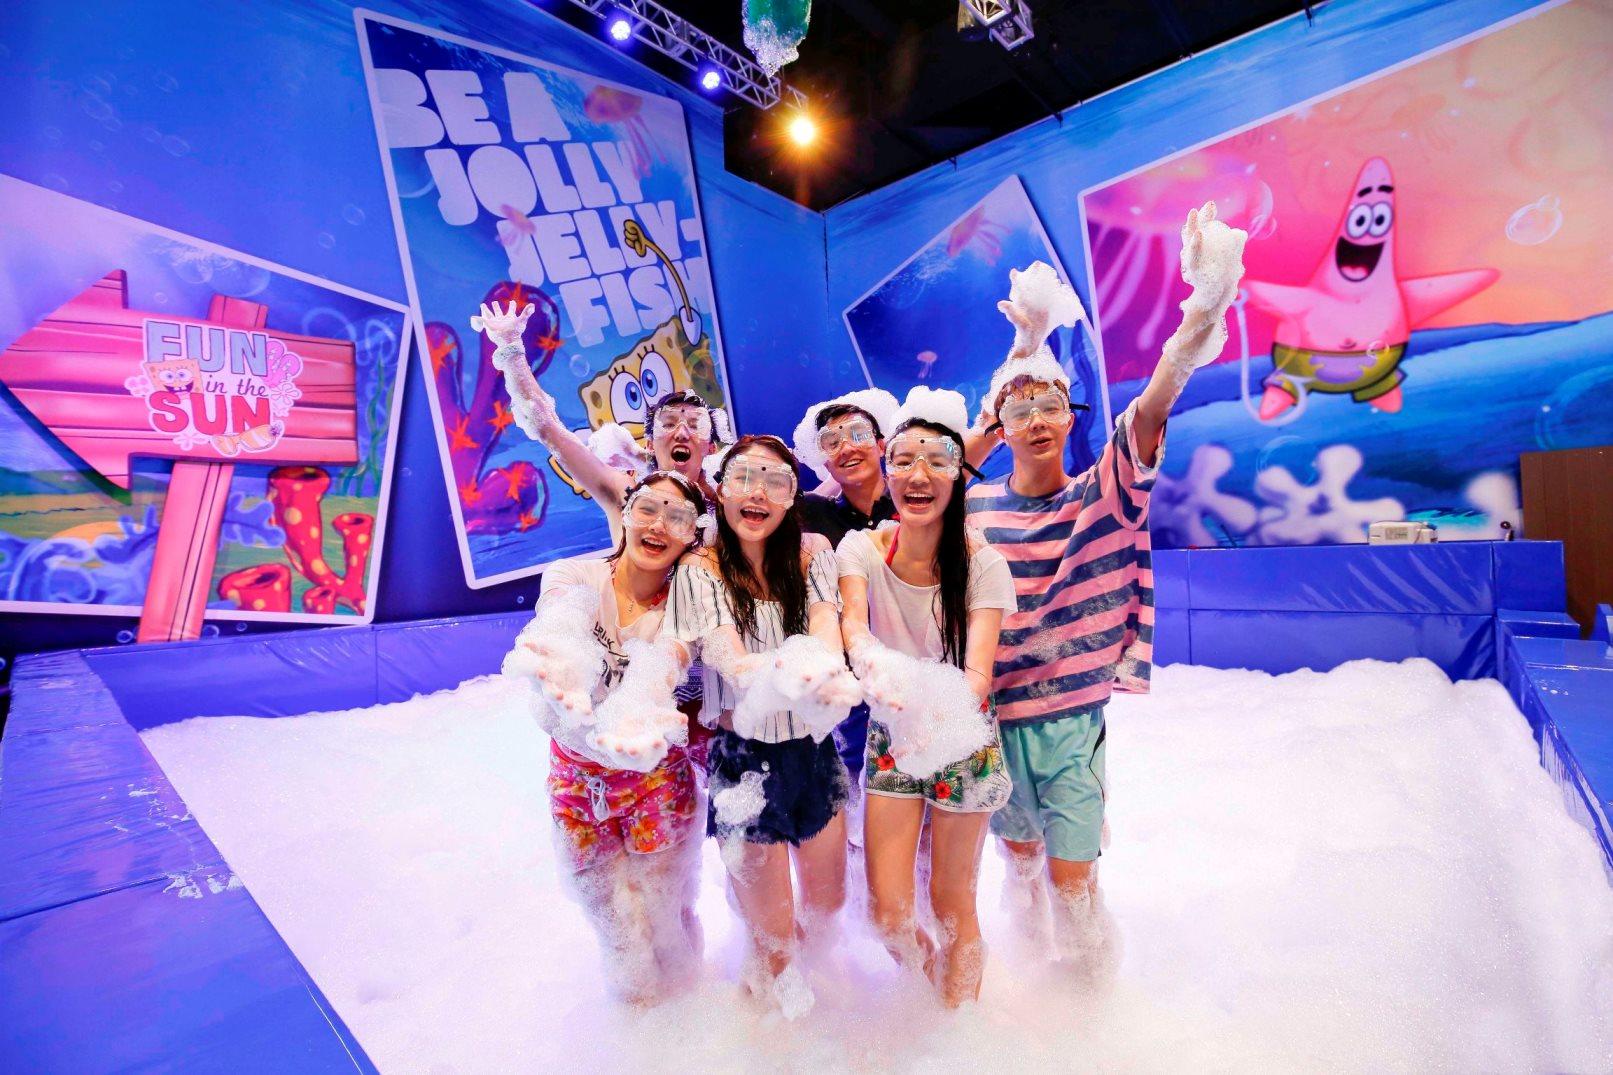 https://www.thestandard.com.hk/section-news/section/4/171039/SpongeBob-set-to-make-Summer-Splash-at-Ocean-Park